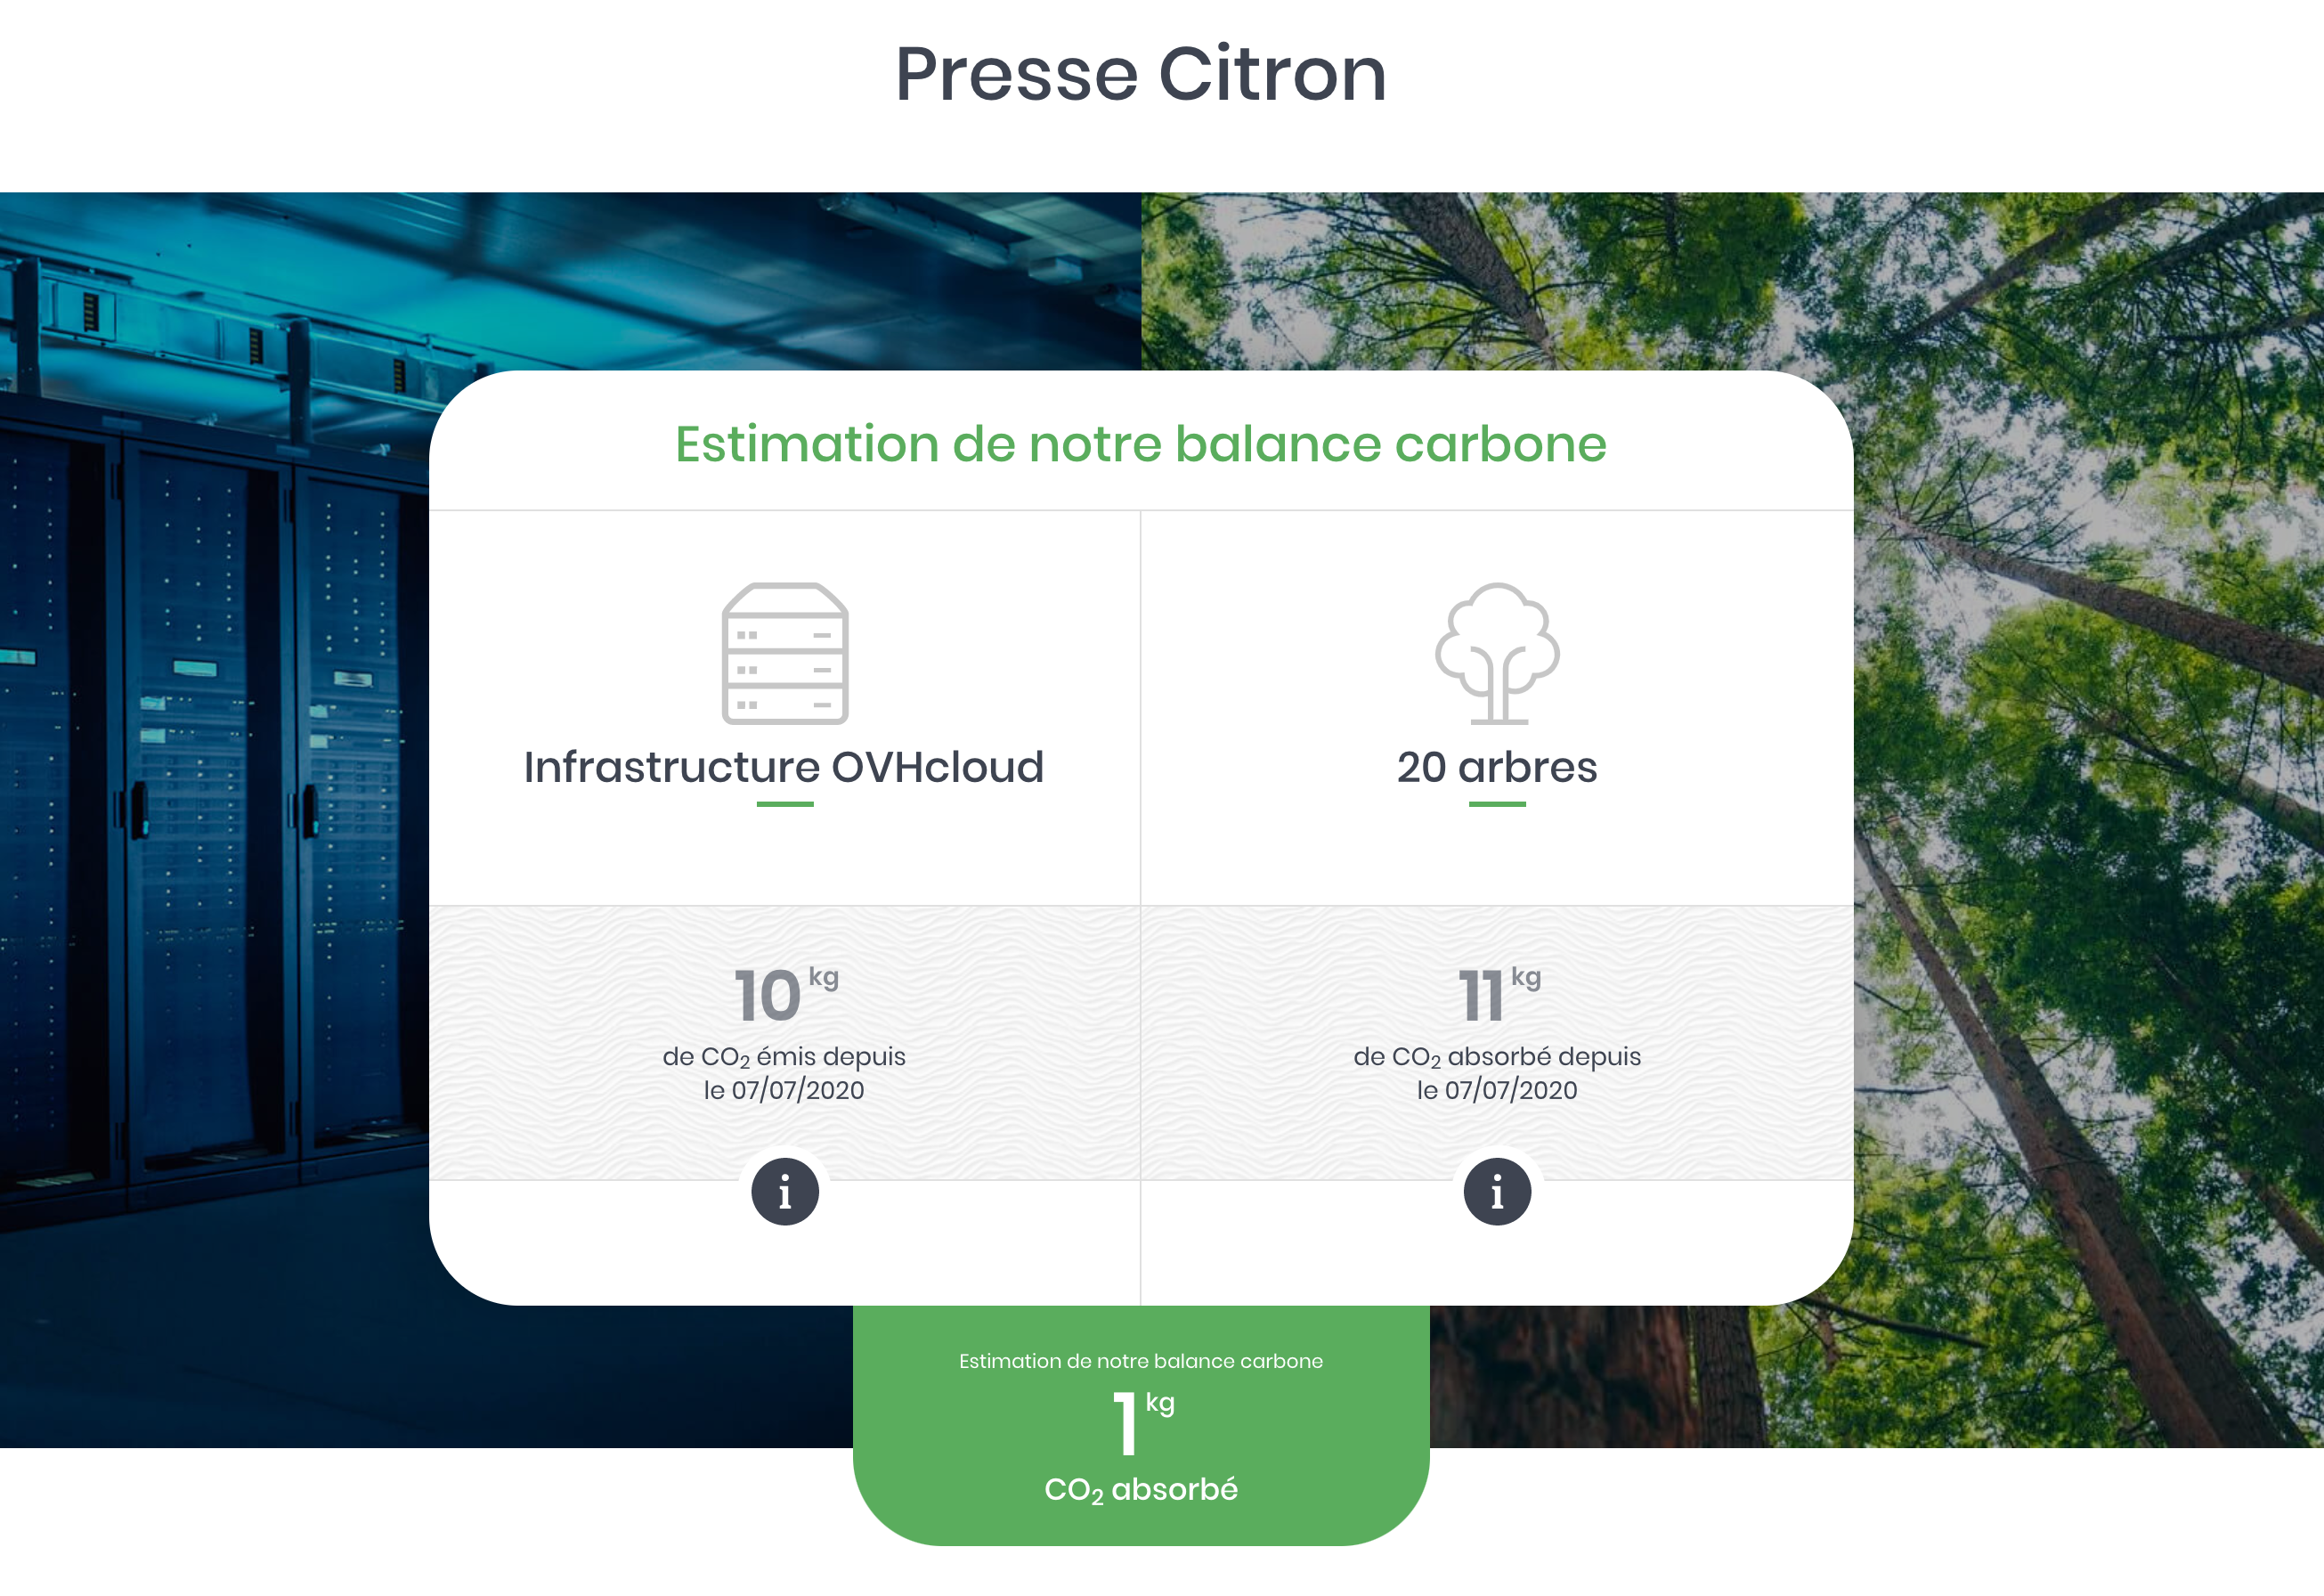 Bilan Carbone Presse-citron